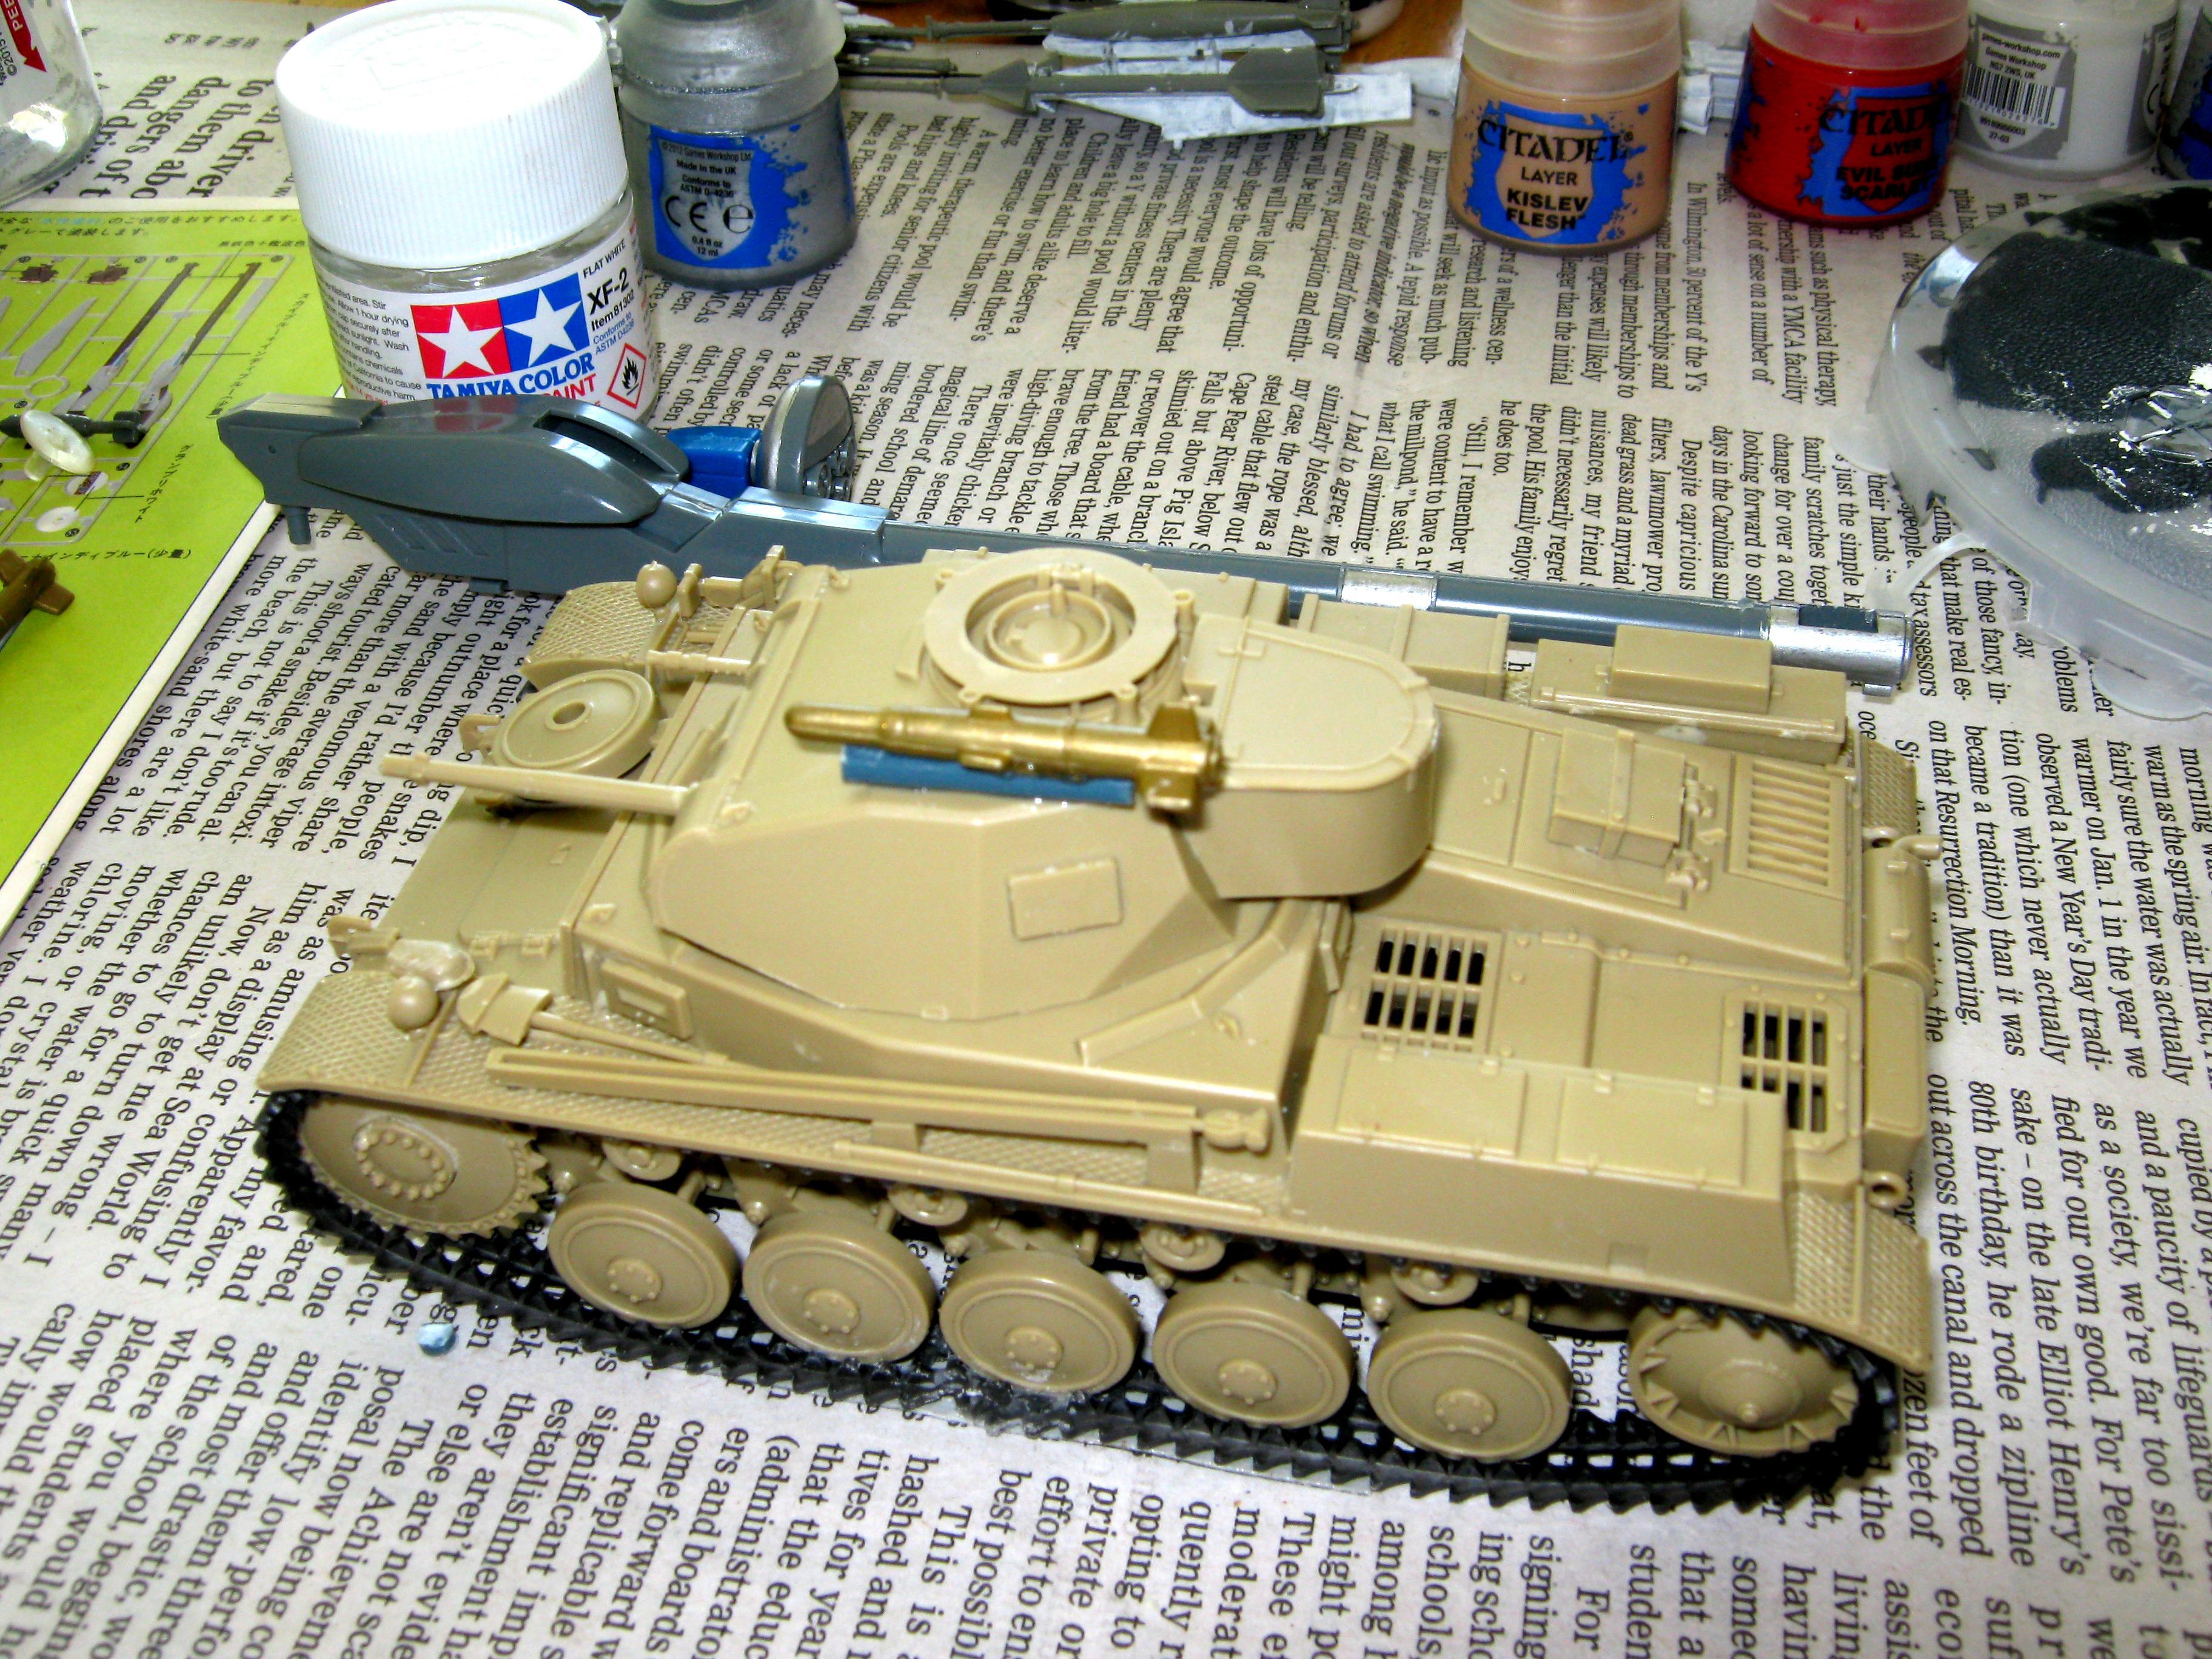 Conversion, Panzer, Panzer Ii, Tank, World War 2